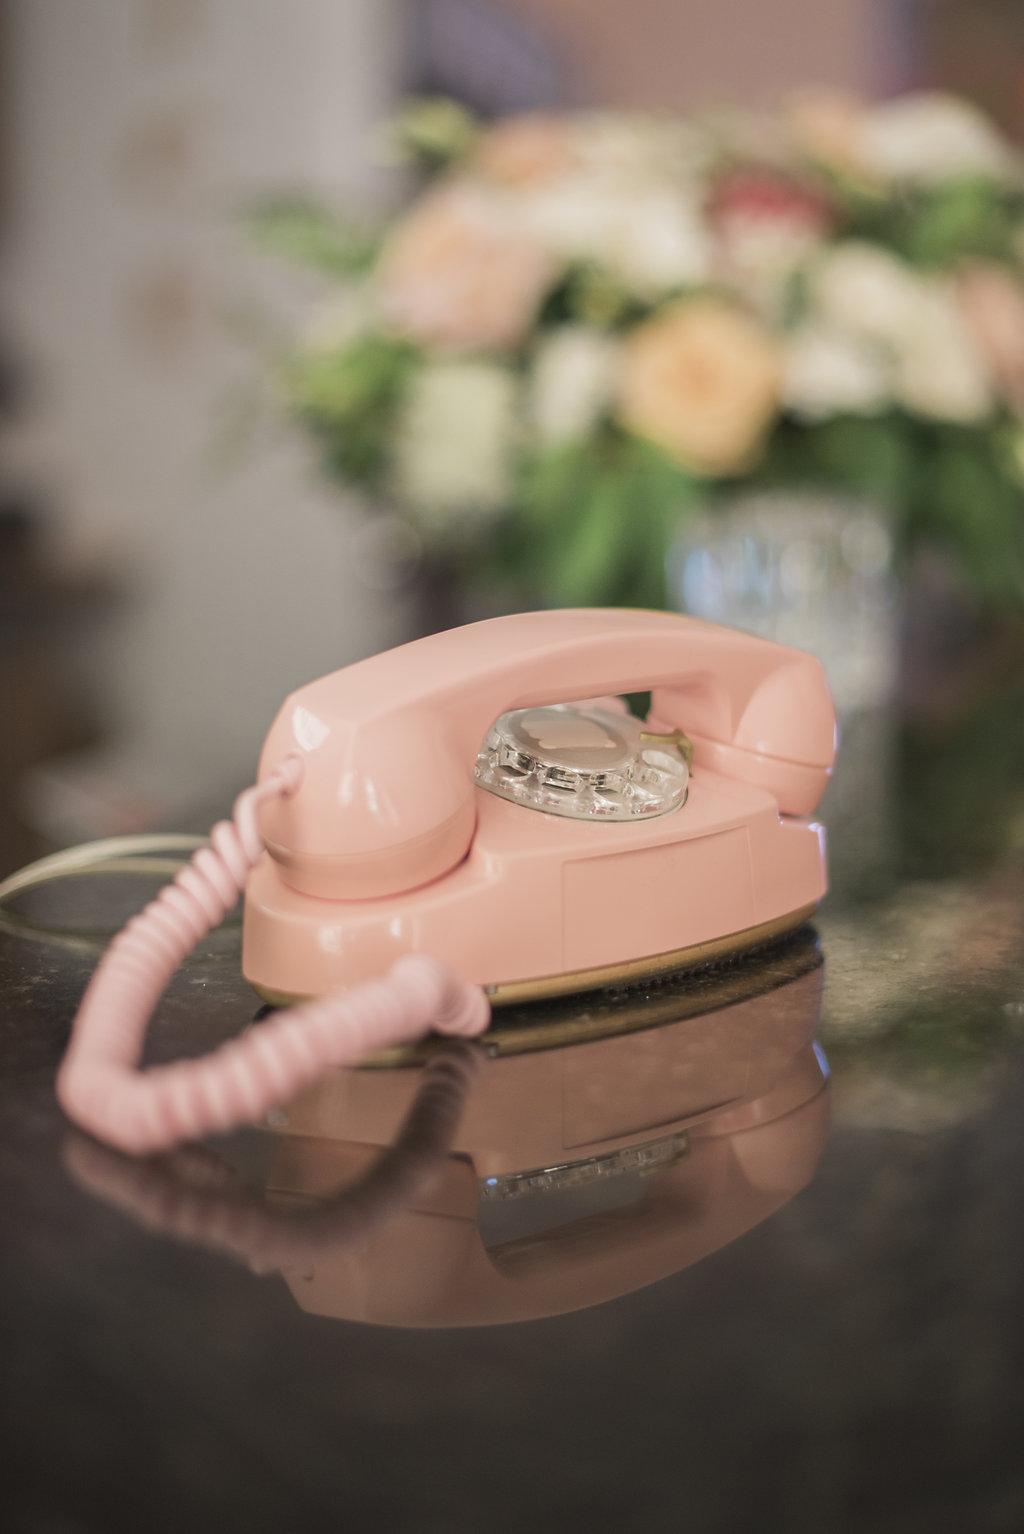 Motel-Restaurant-Editorial-Vineyard-Bride-photo-by-Blynda-DaCosta-Photography-009.JPG